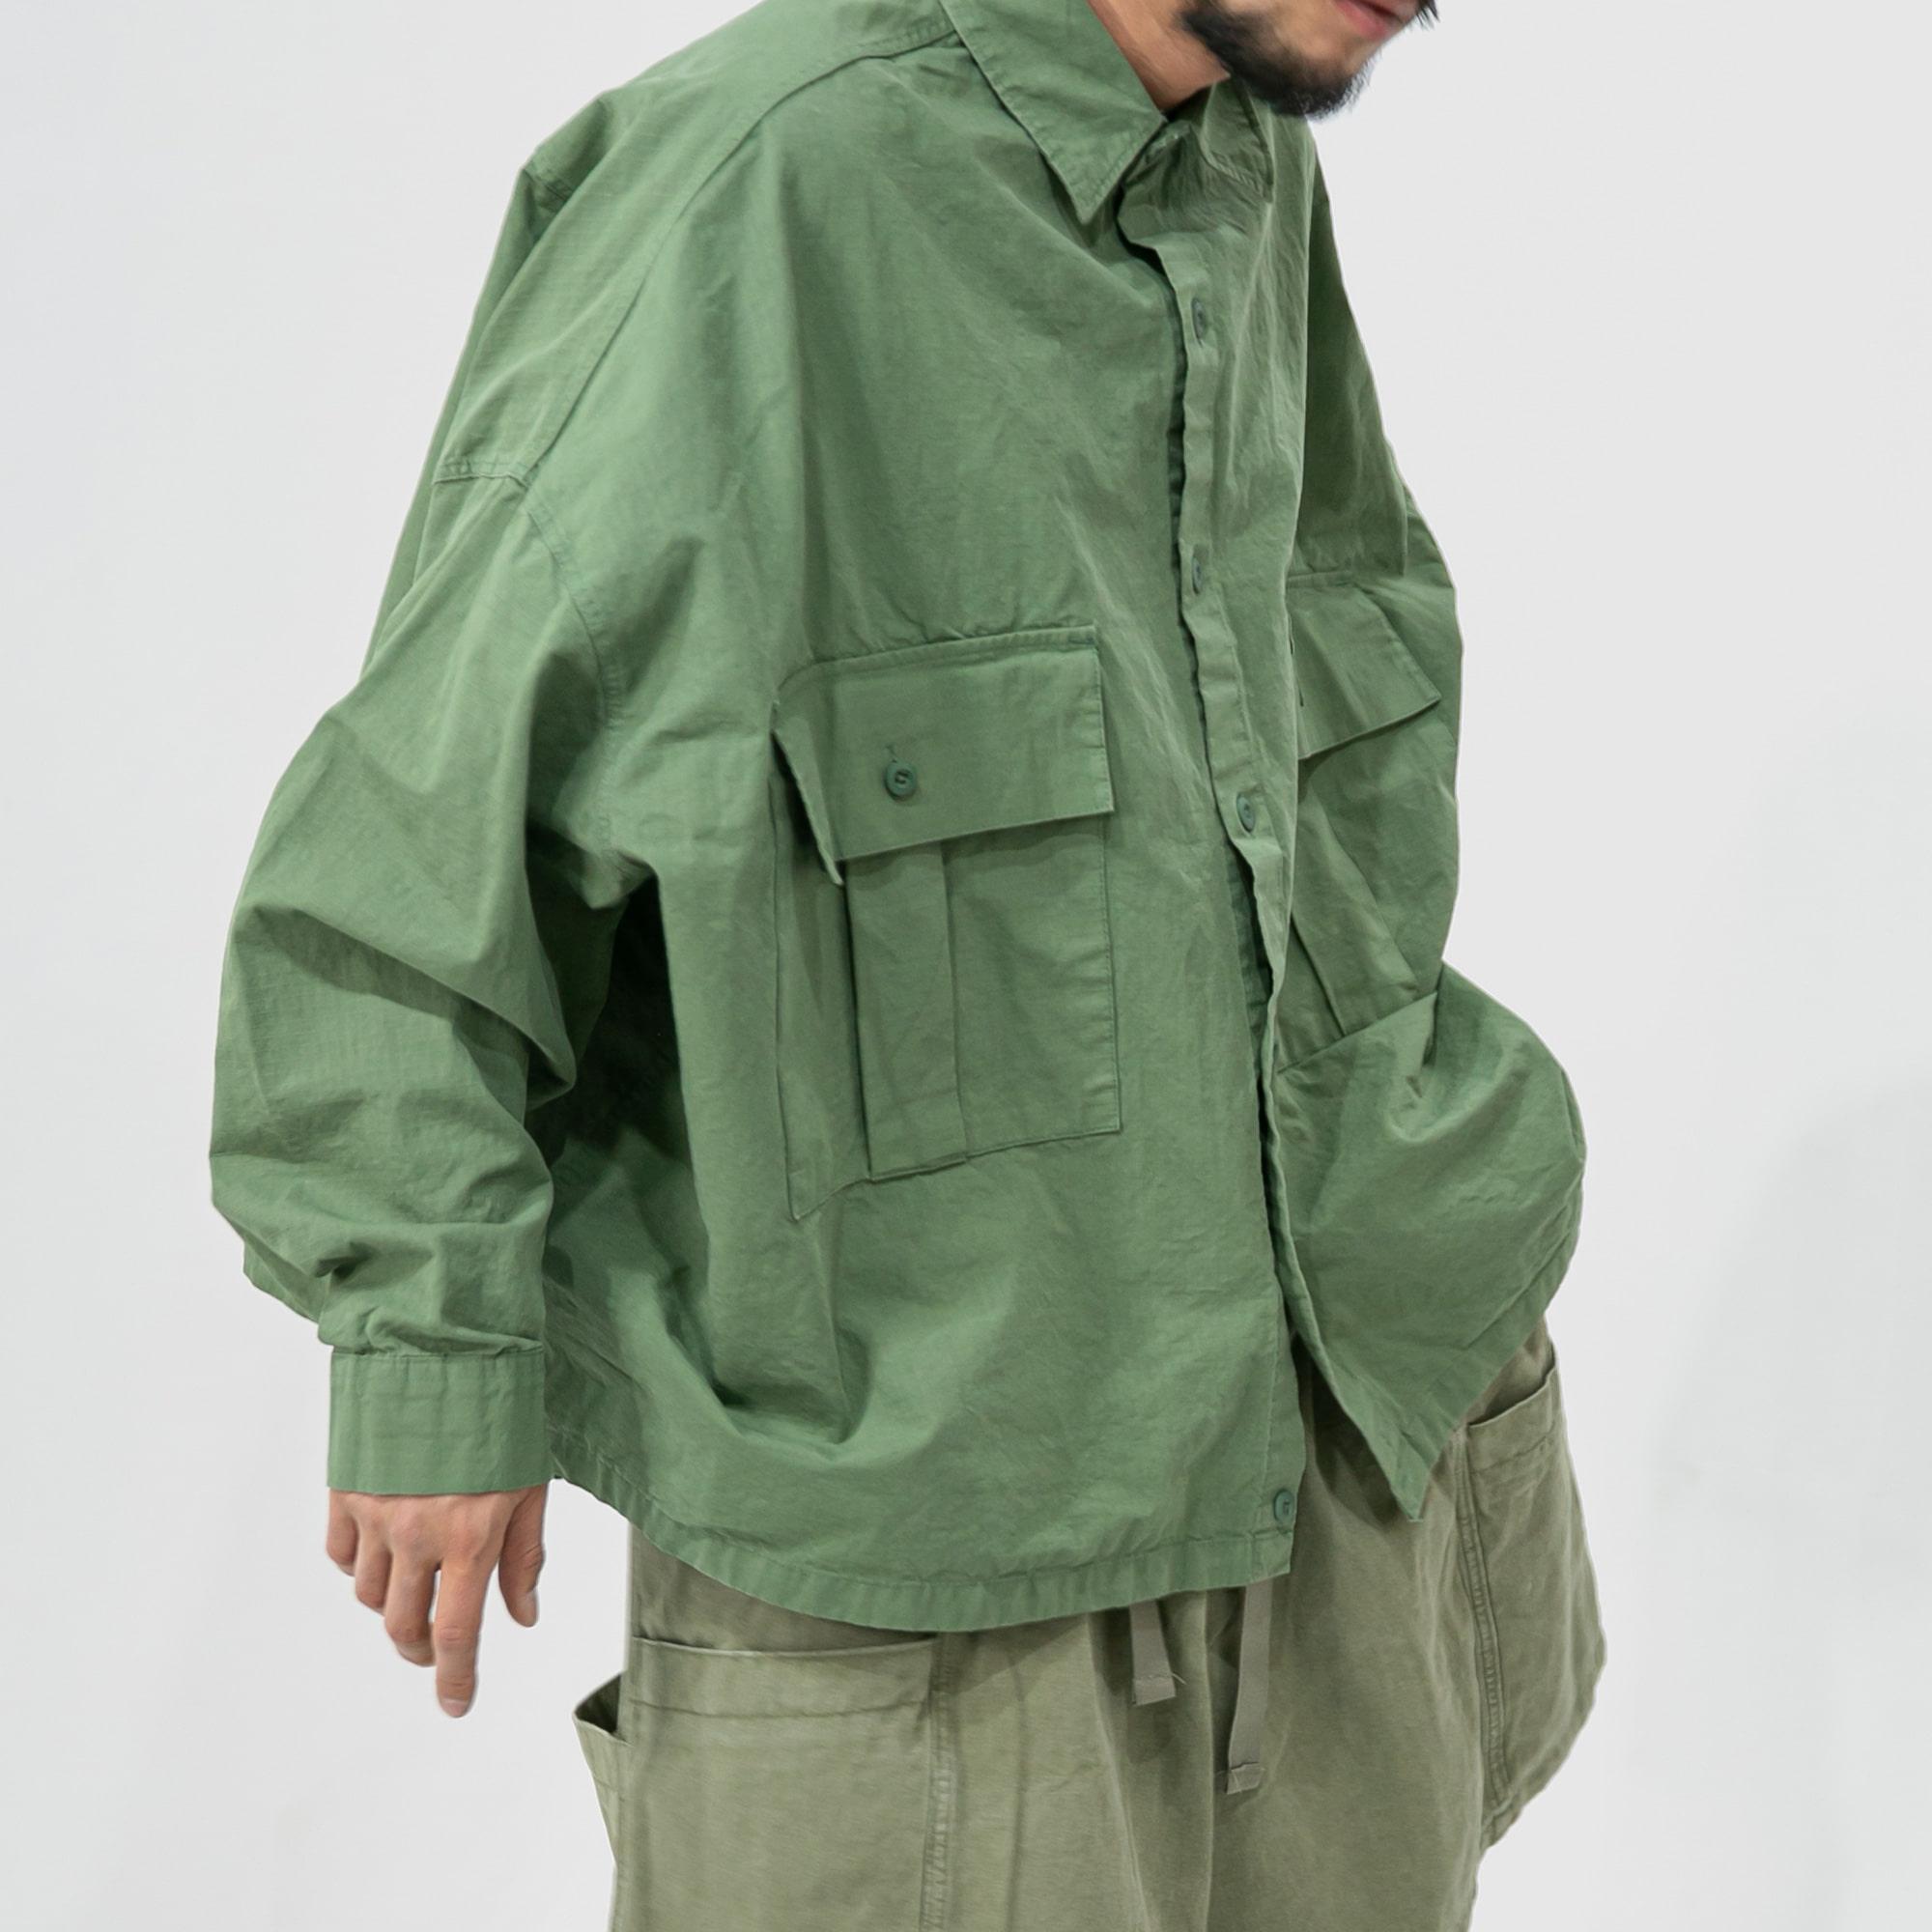 Rib Army Cargo Over Shirt - Khaki